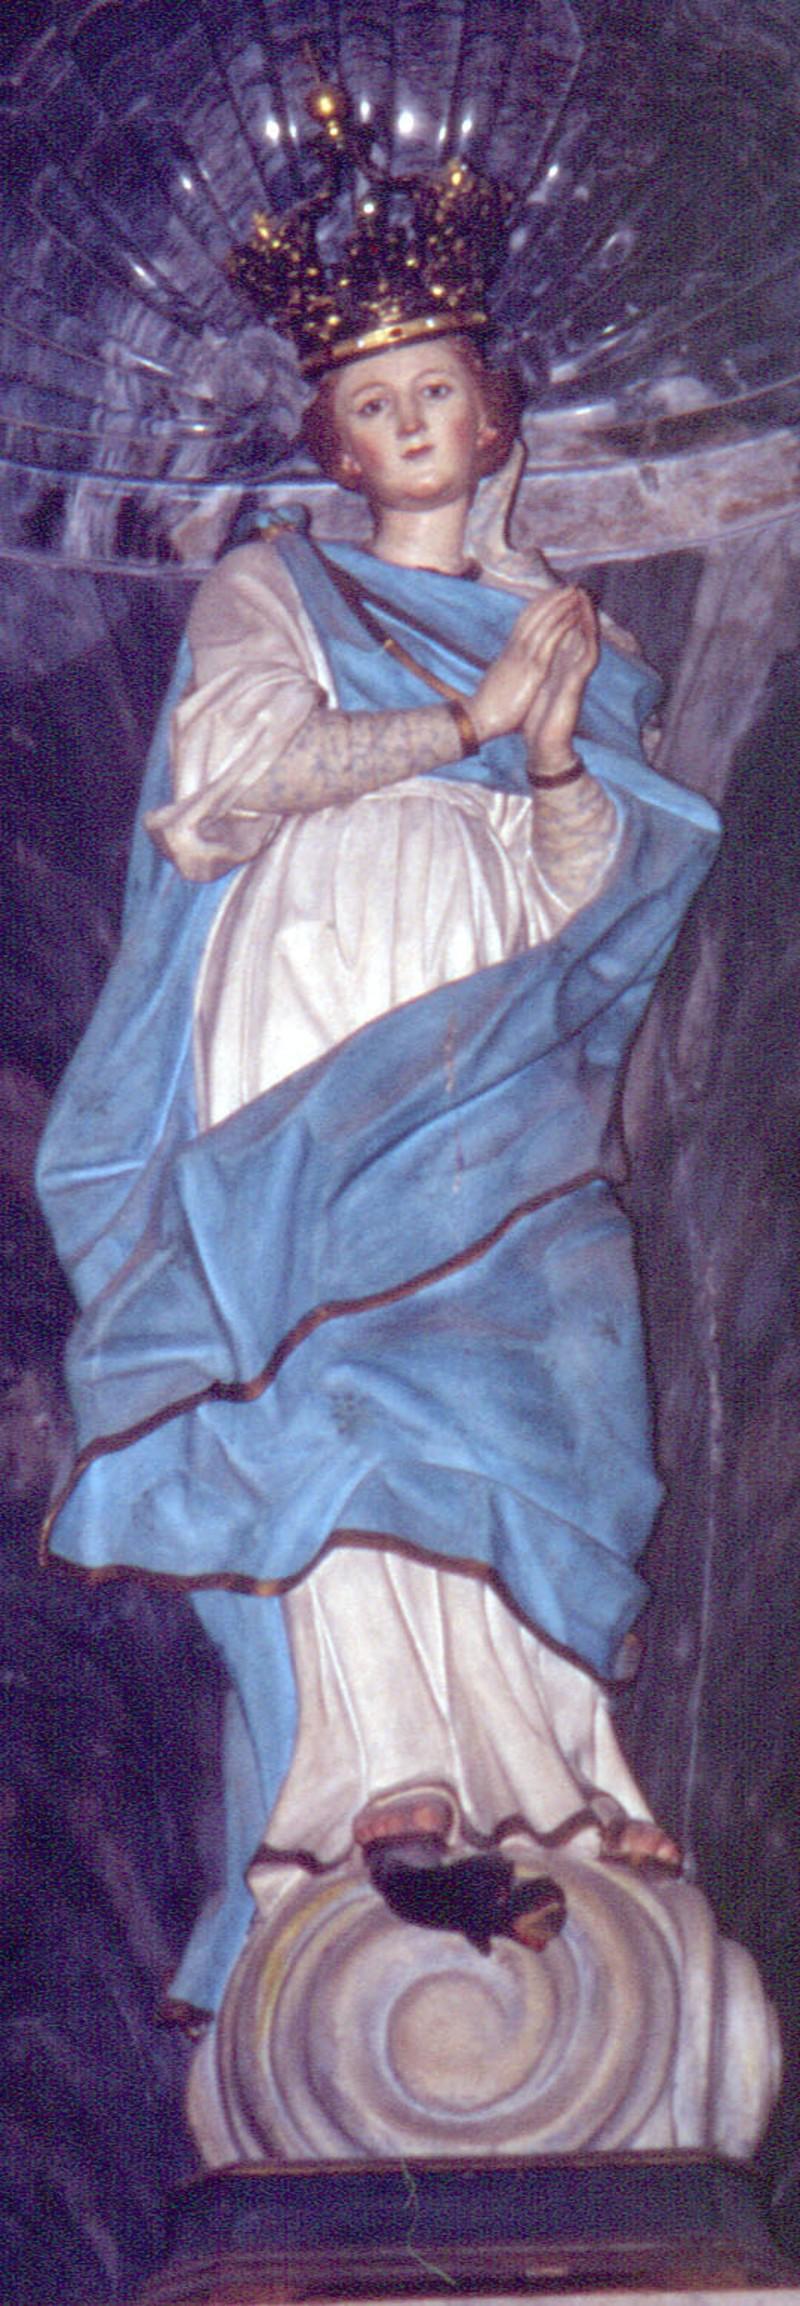 Lonis G.A. (1763-1765), Vergine Immacolata